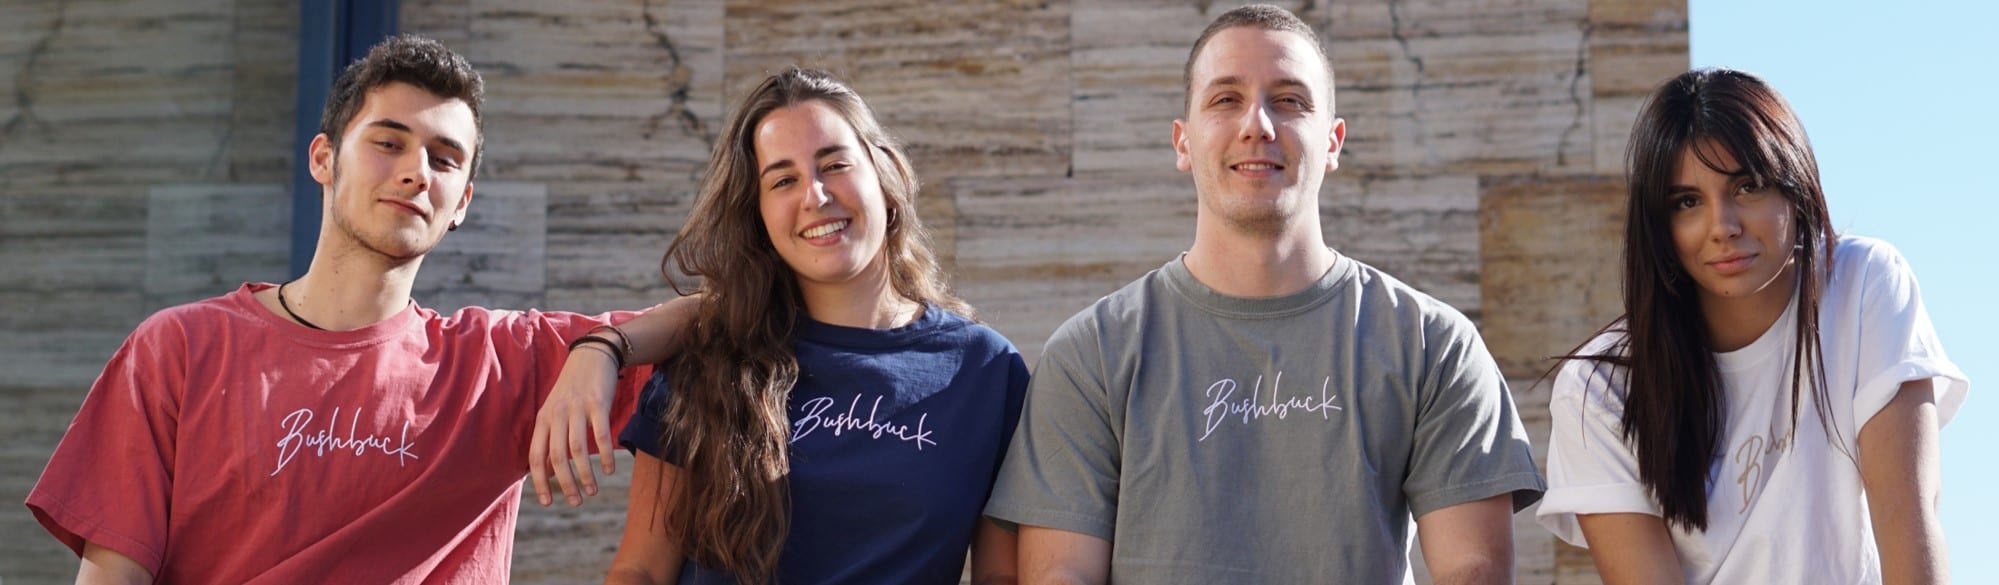 grupo_camisetas